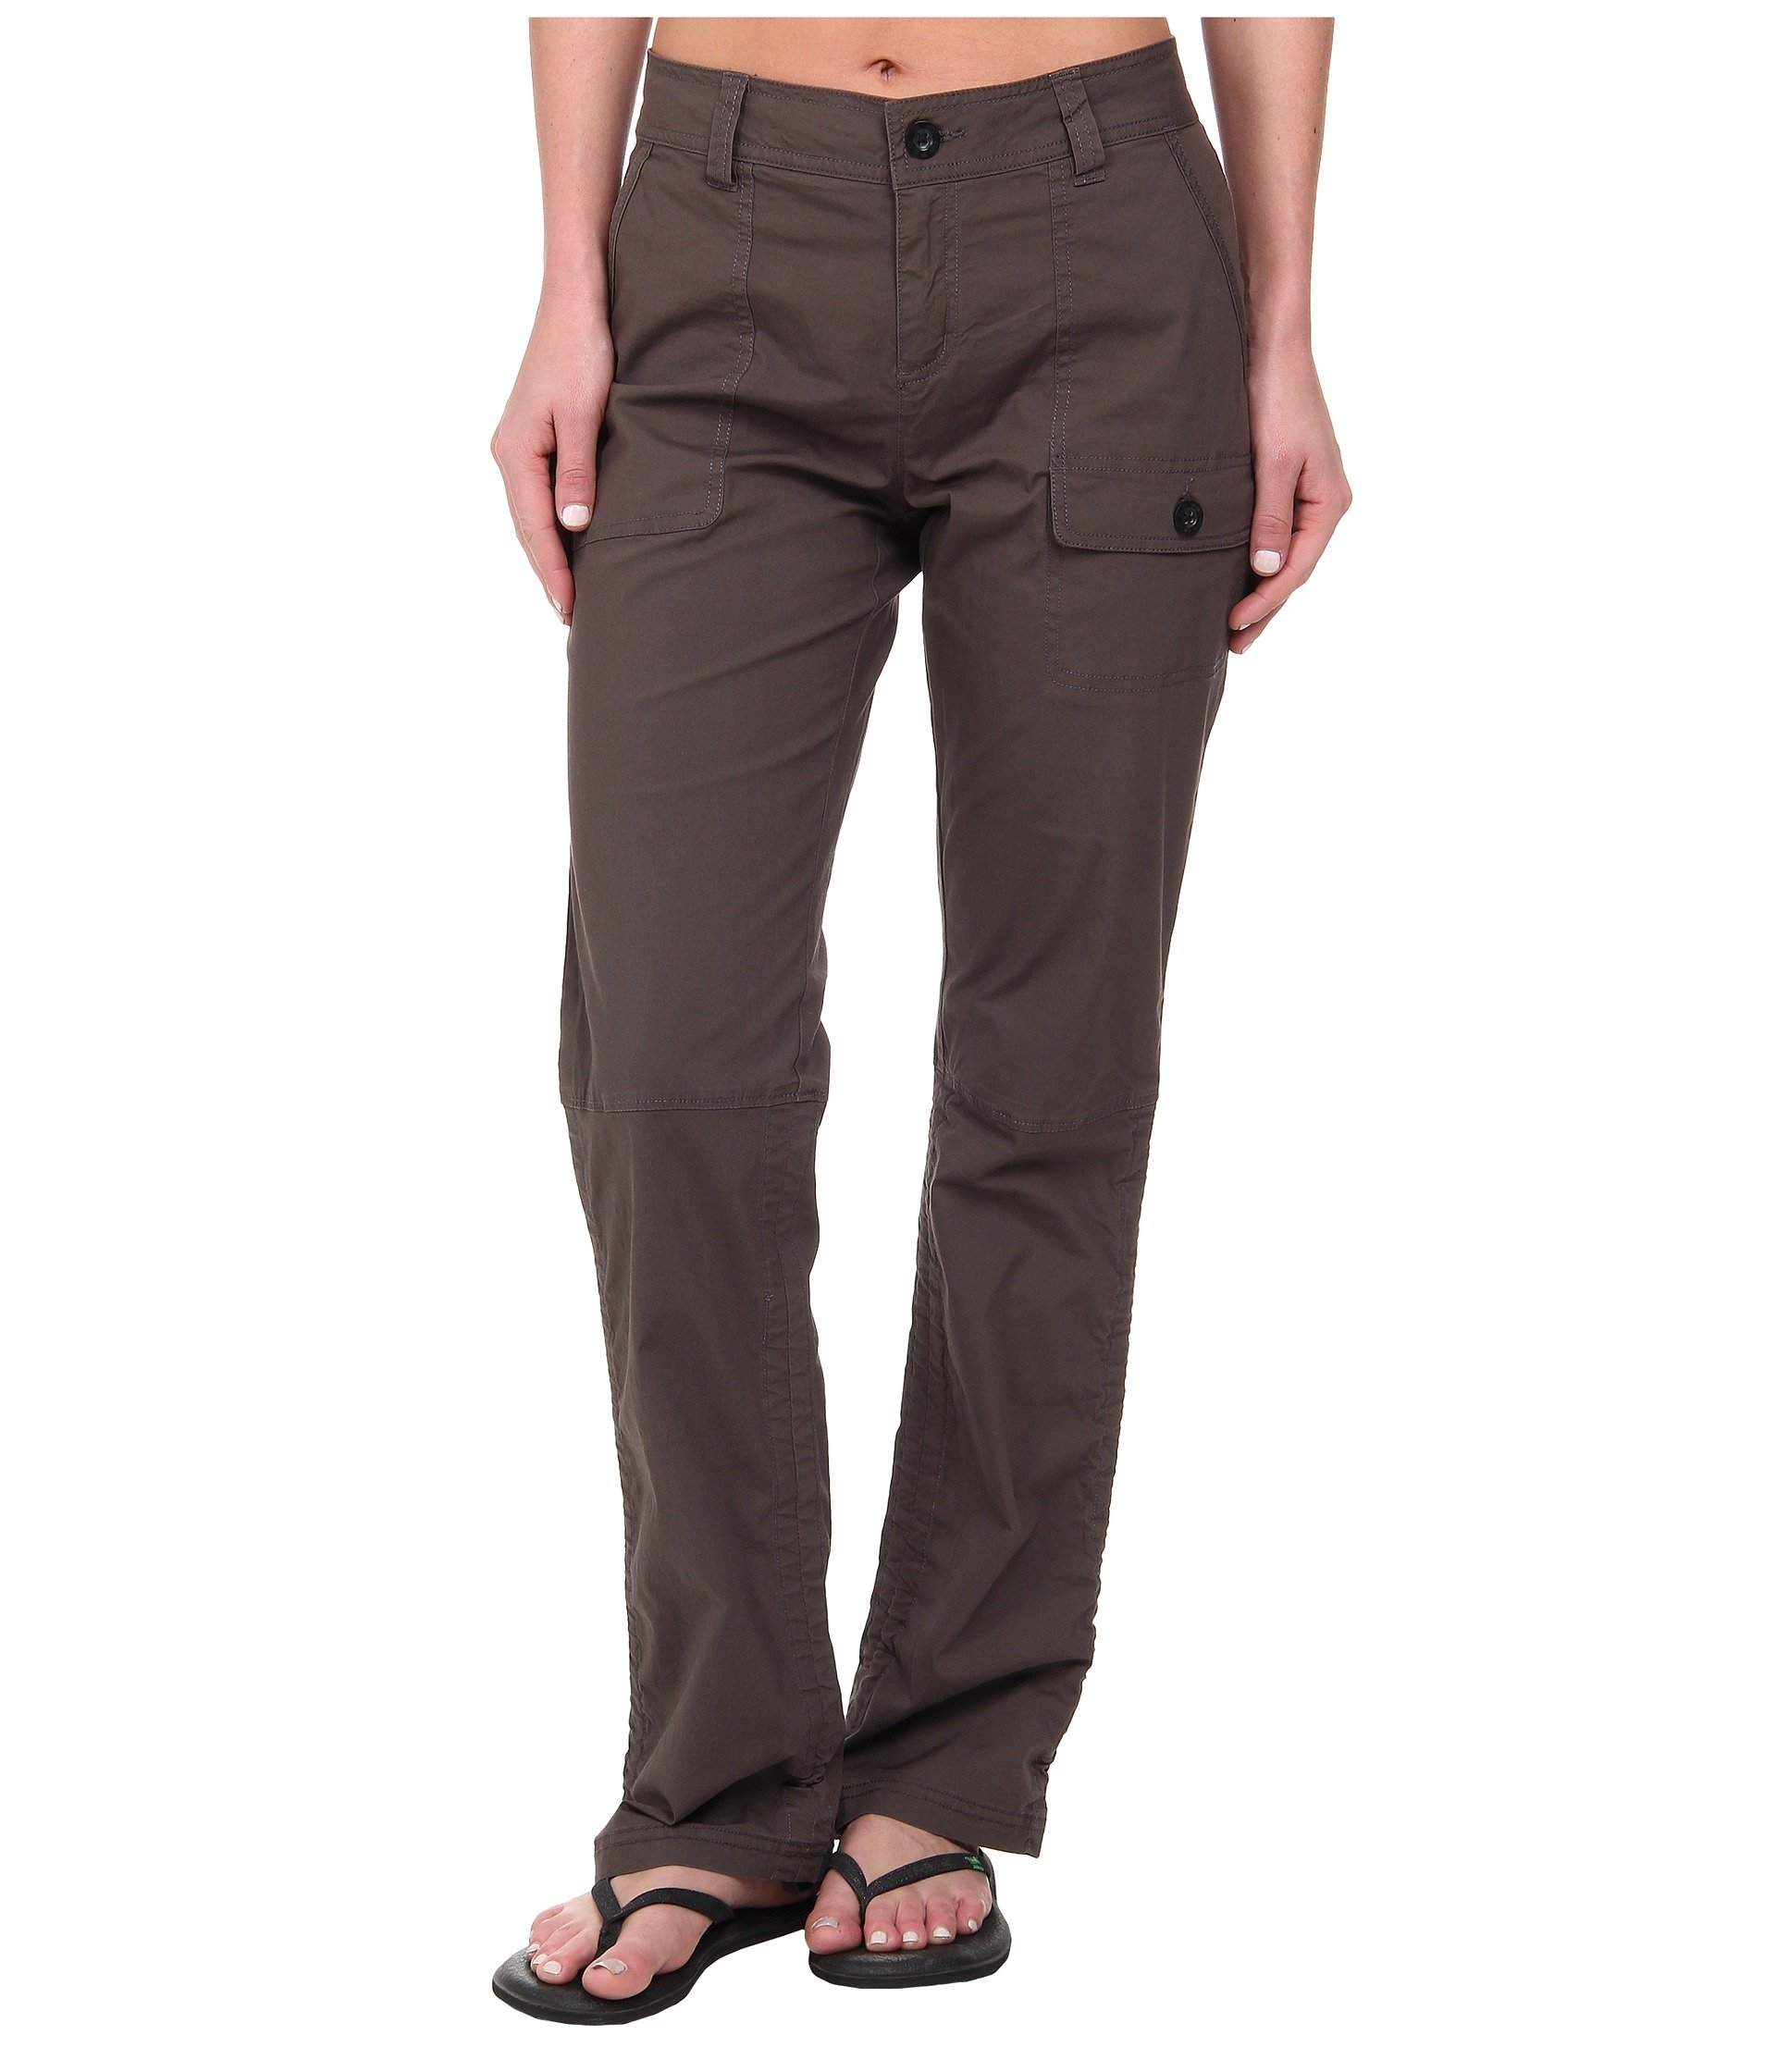 Pantalón para Mujer Woolrich Laurel Run Convertible Pant  + Woolrich en VeoyCompro.net